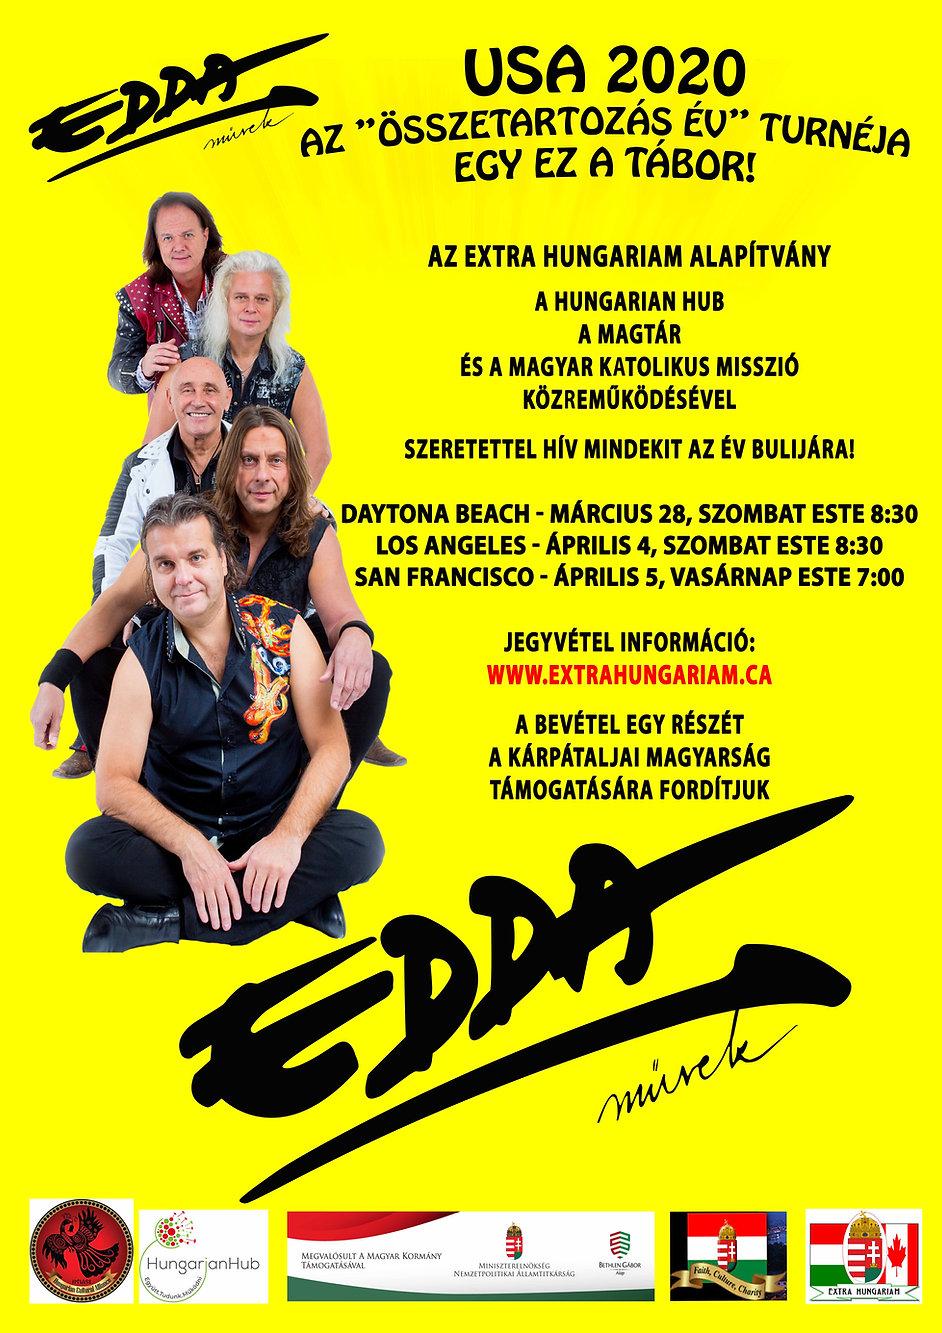 EDDA_USAA_2020_postertoprint_JOINT_HUN_0